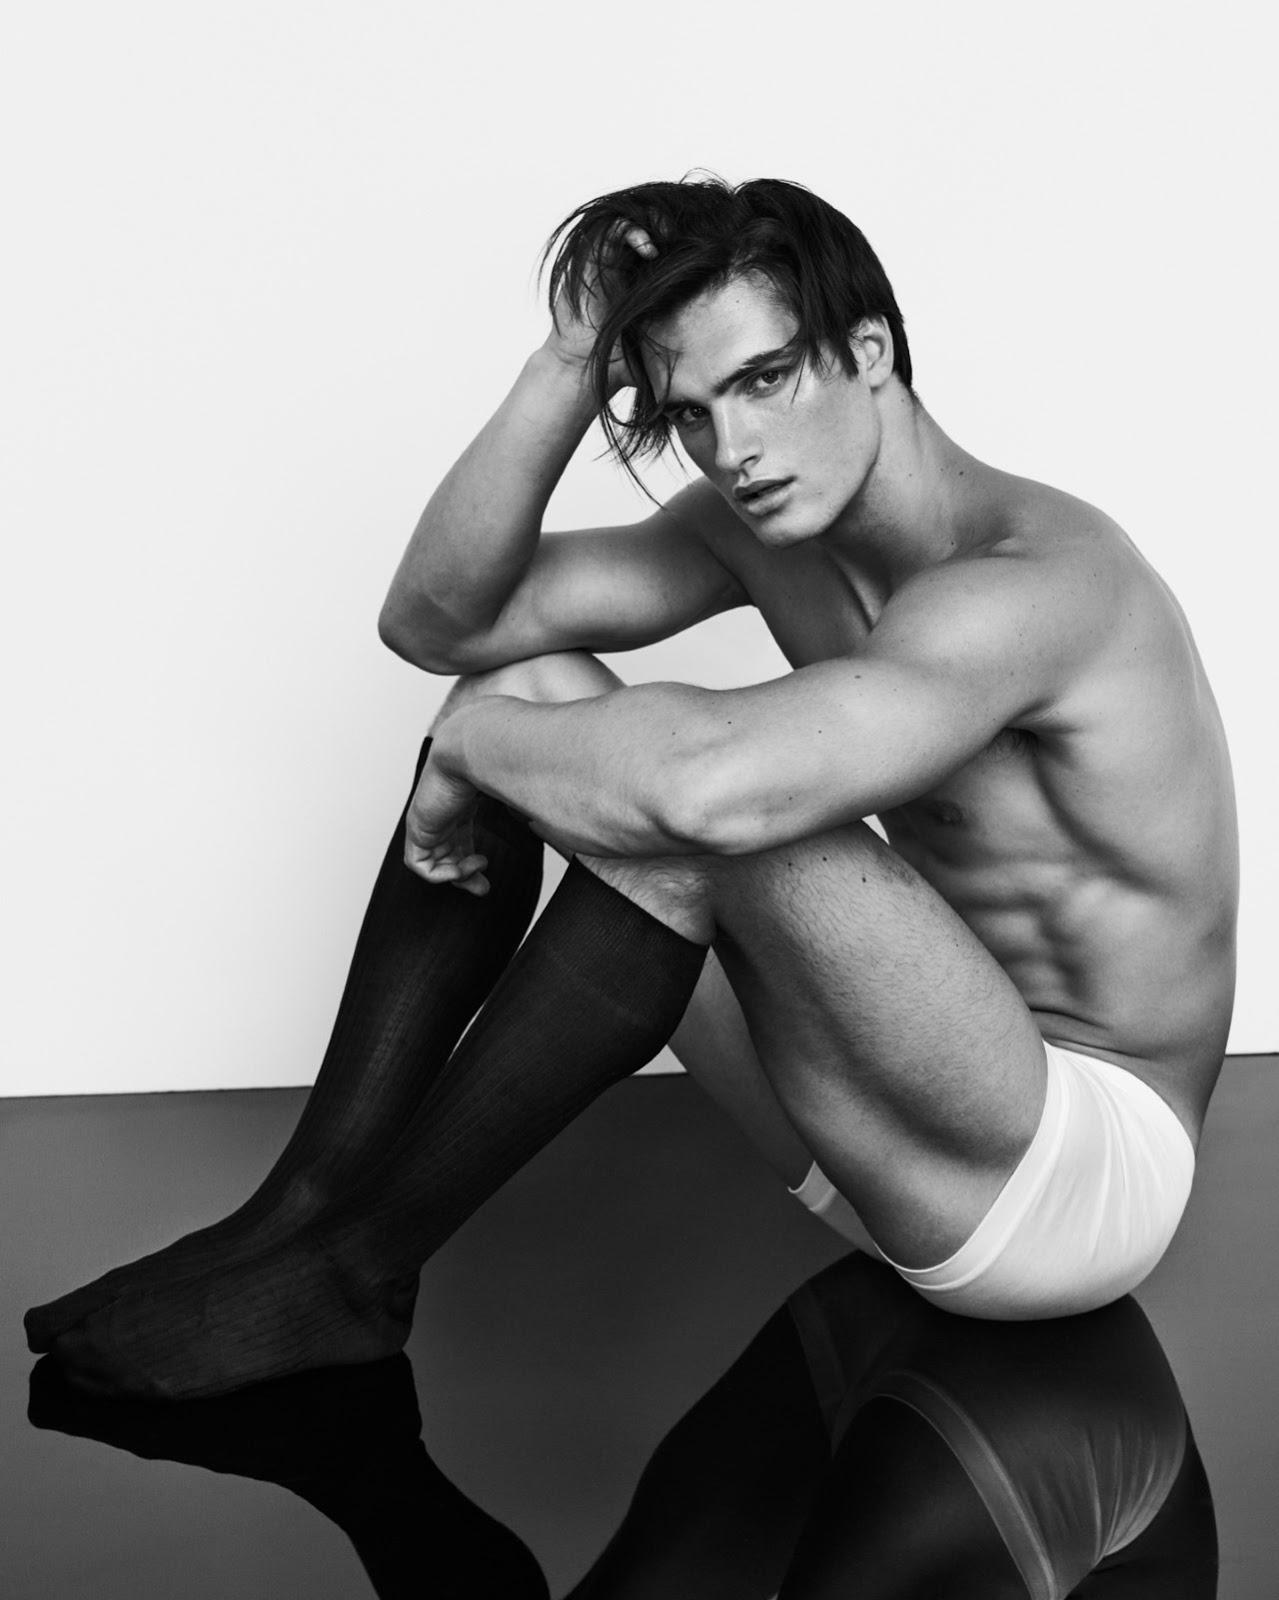 Matthew Terry by Mariano Vivanco